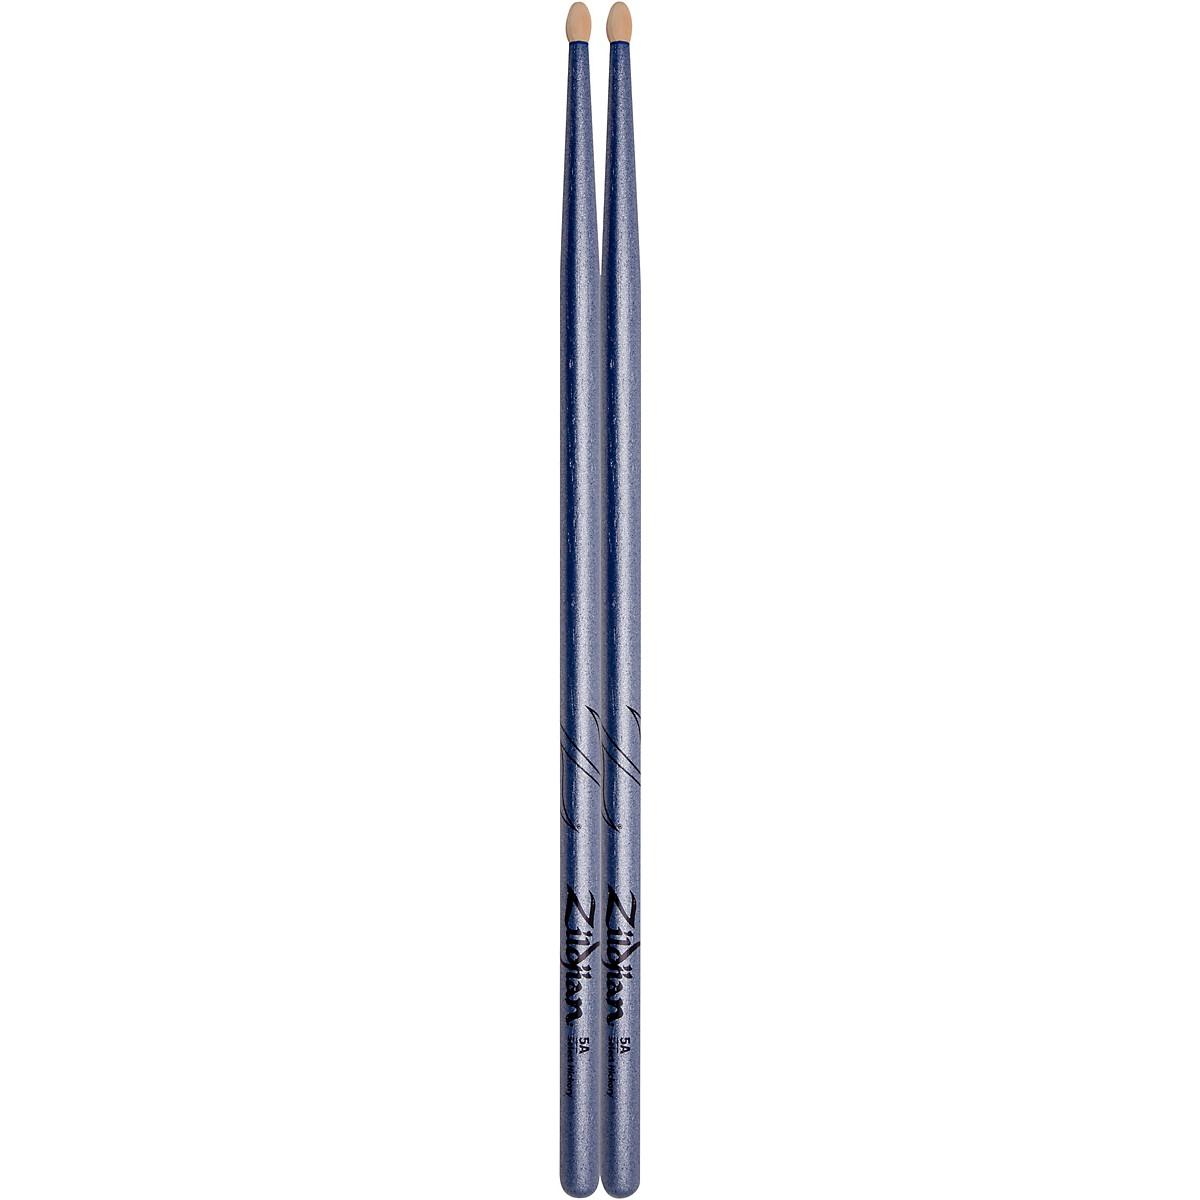 Zildjian Chroma Blue Drum Sticks